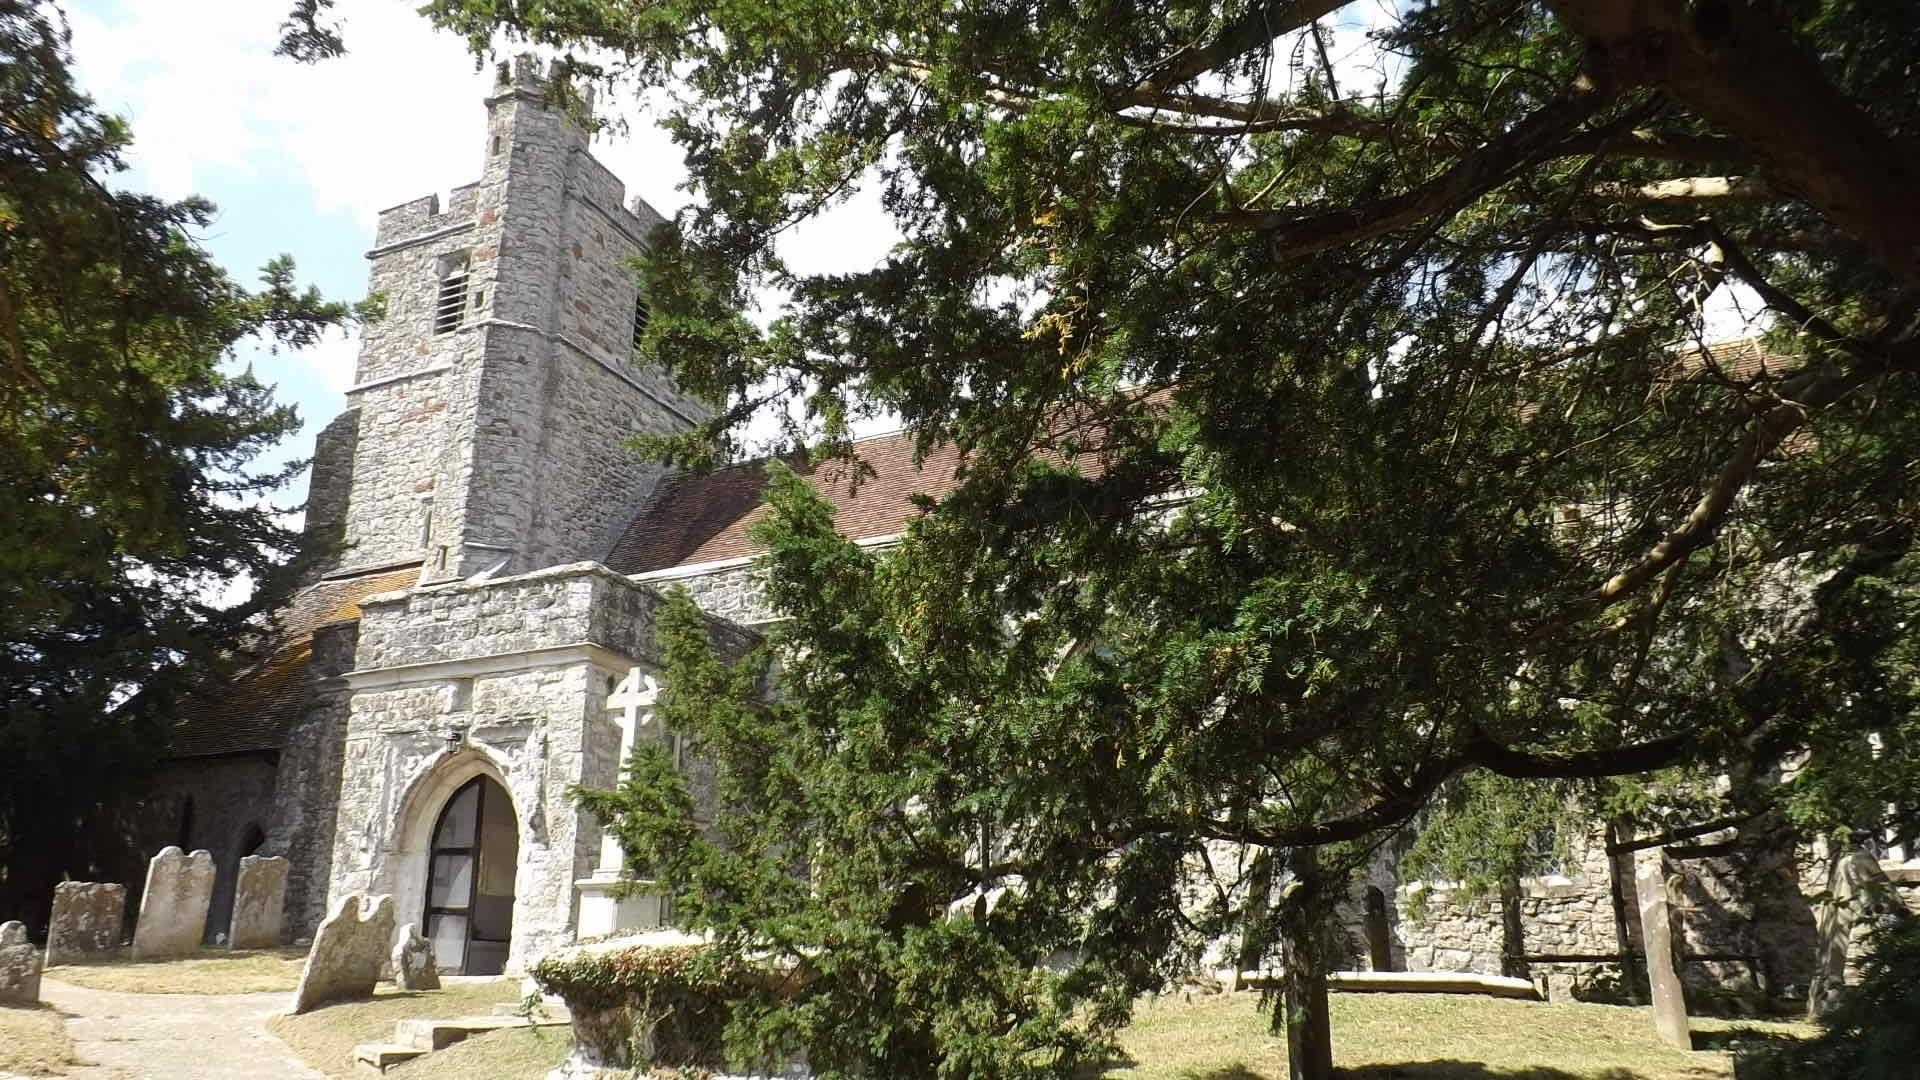 Ulcombe Church